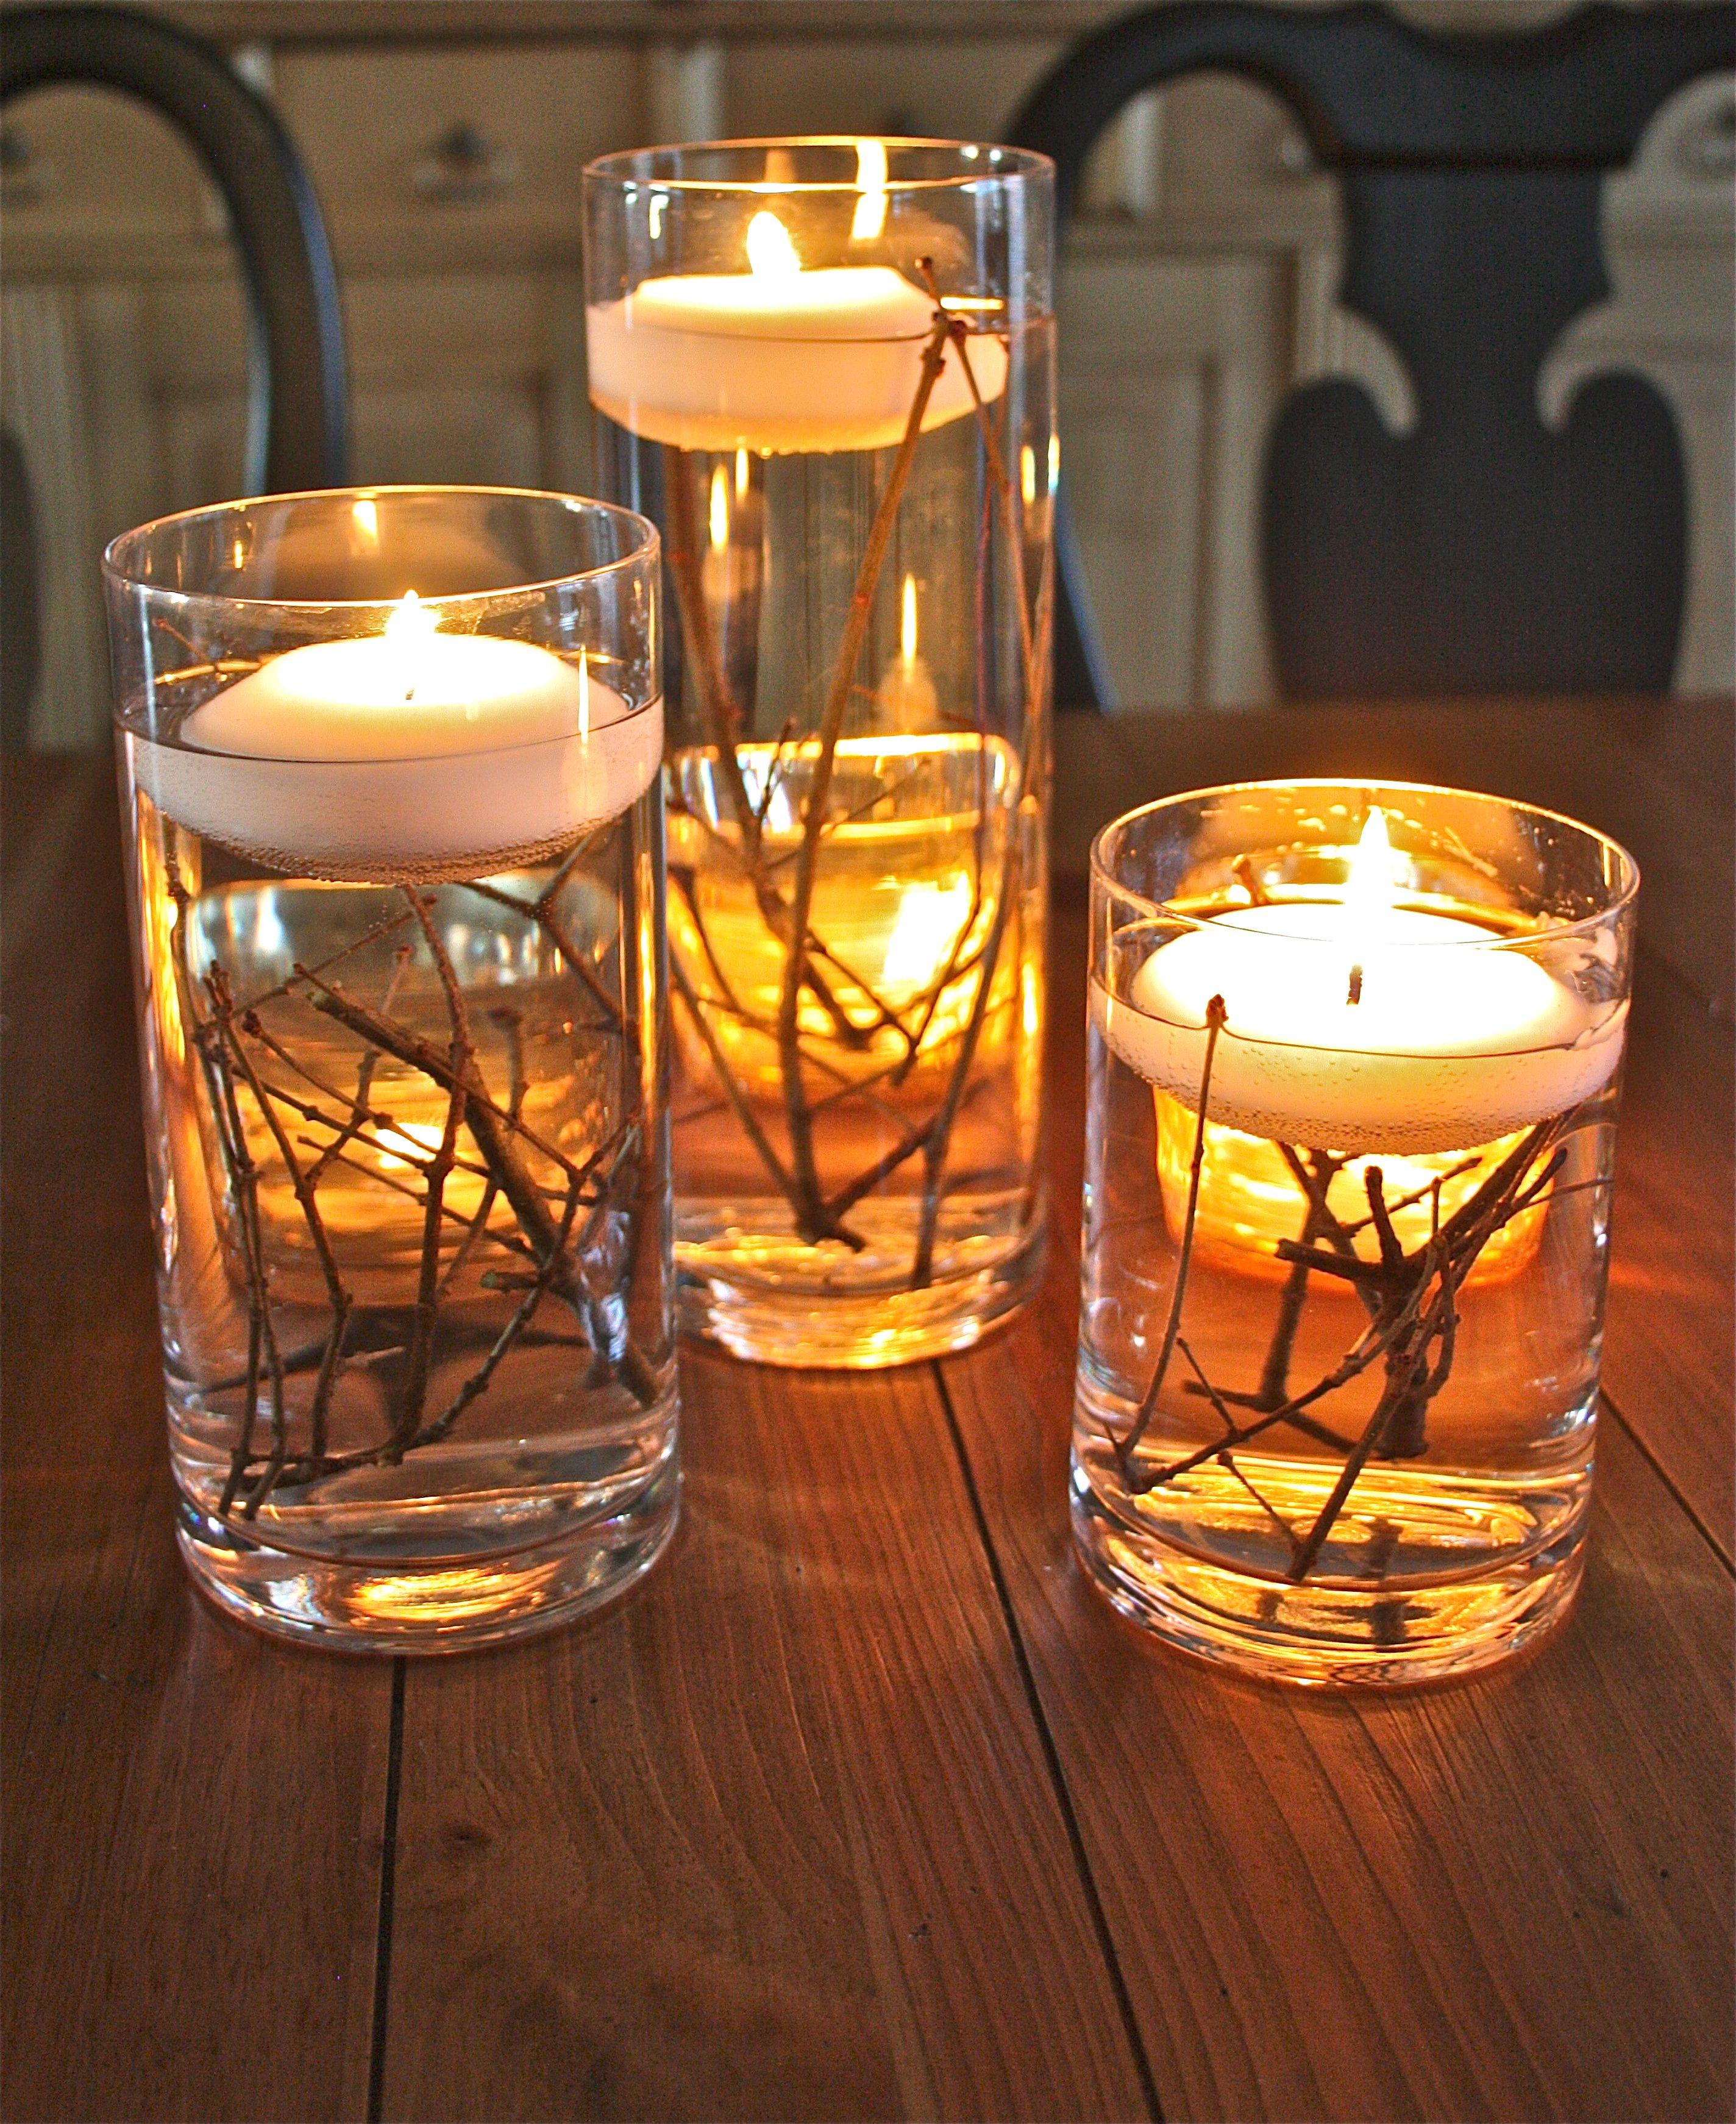 29 Mason Jar Fall Crafts - Autumn DIY Ideas with Mason Jars